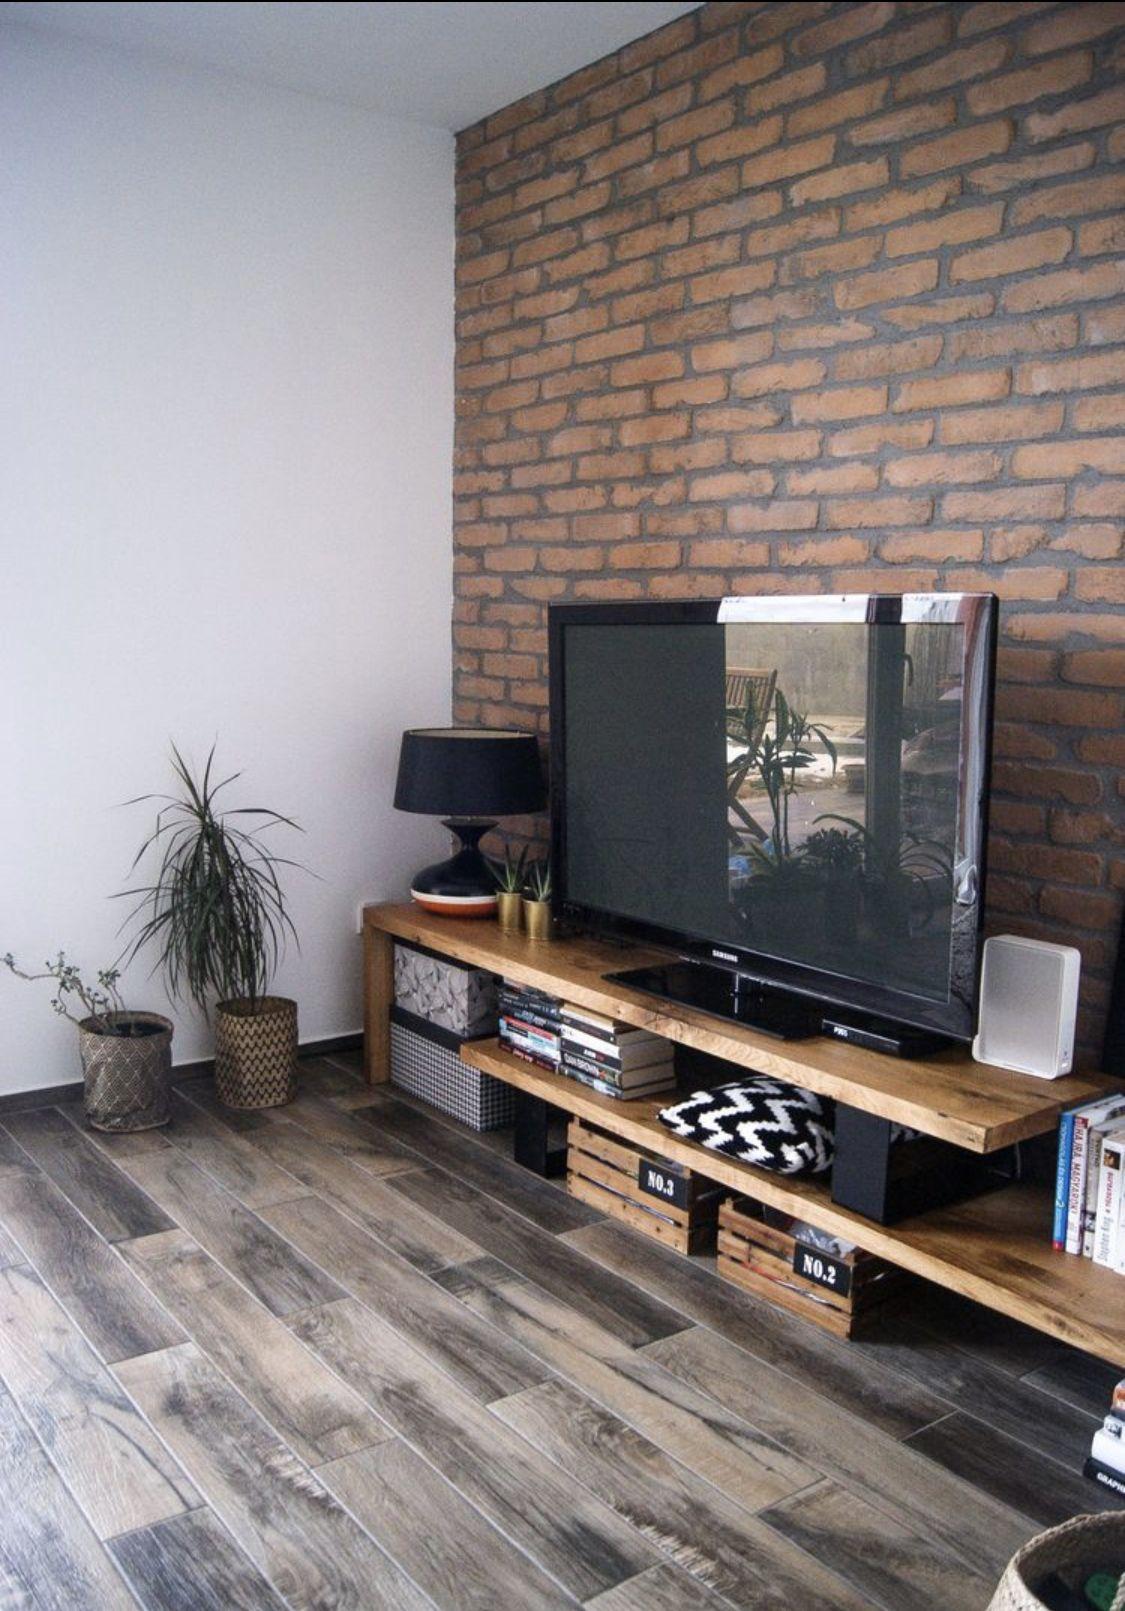 Epingle Par Lizbeth Palm Sur Living Room Oturma Odasi Deco Mur Salon Decor Salon Maison Deco Meuble Tele